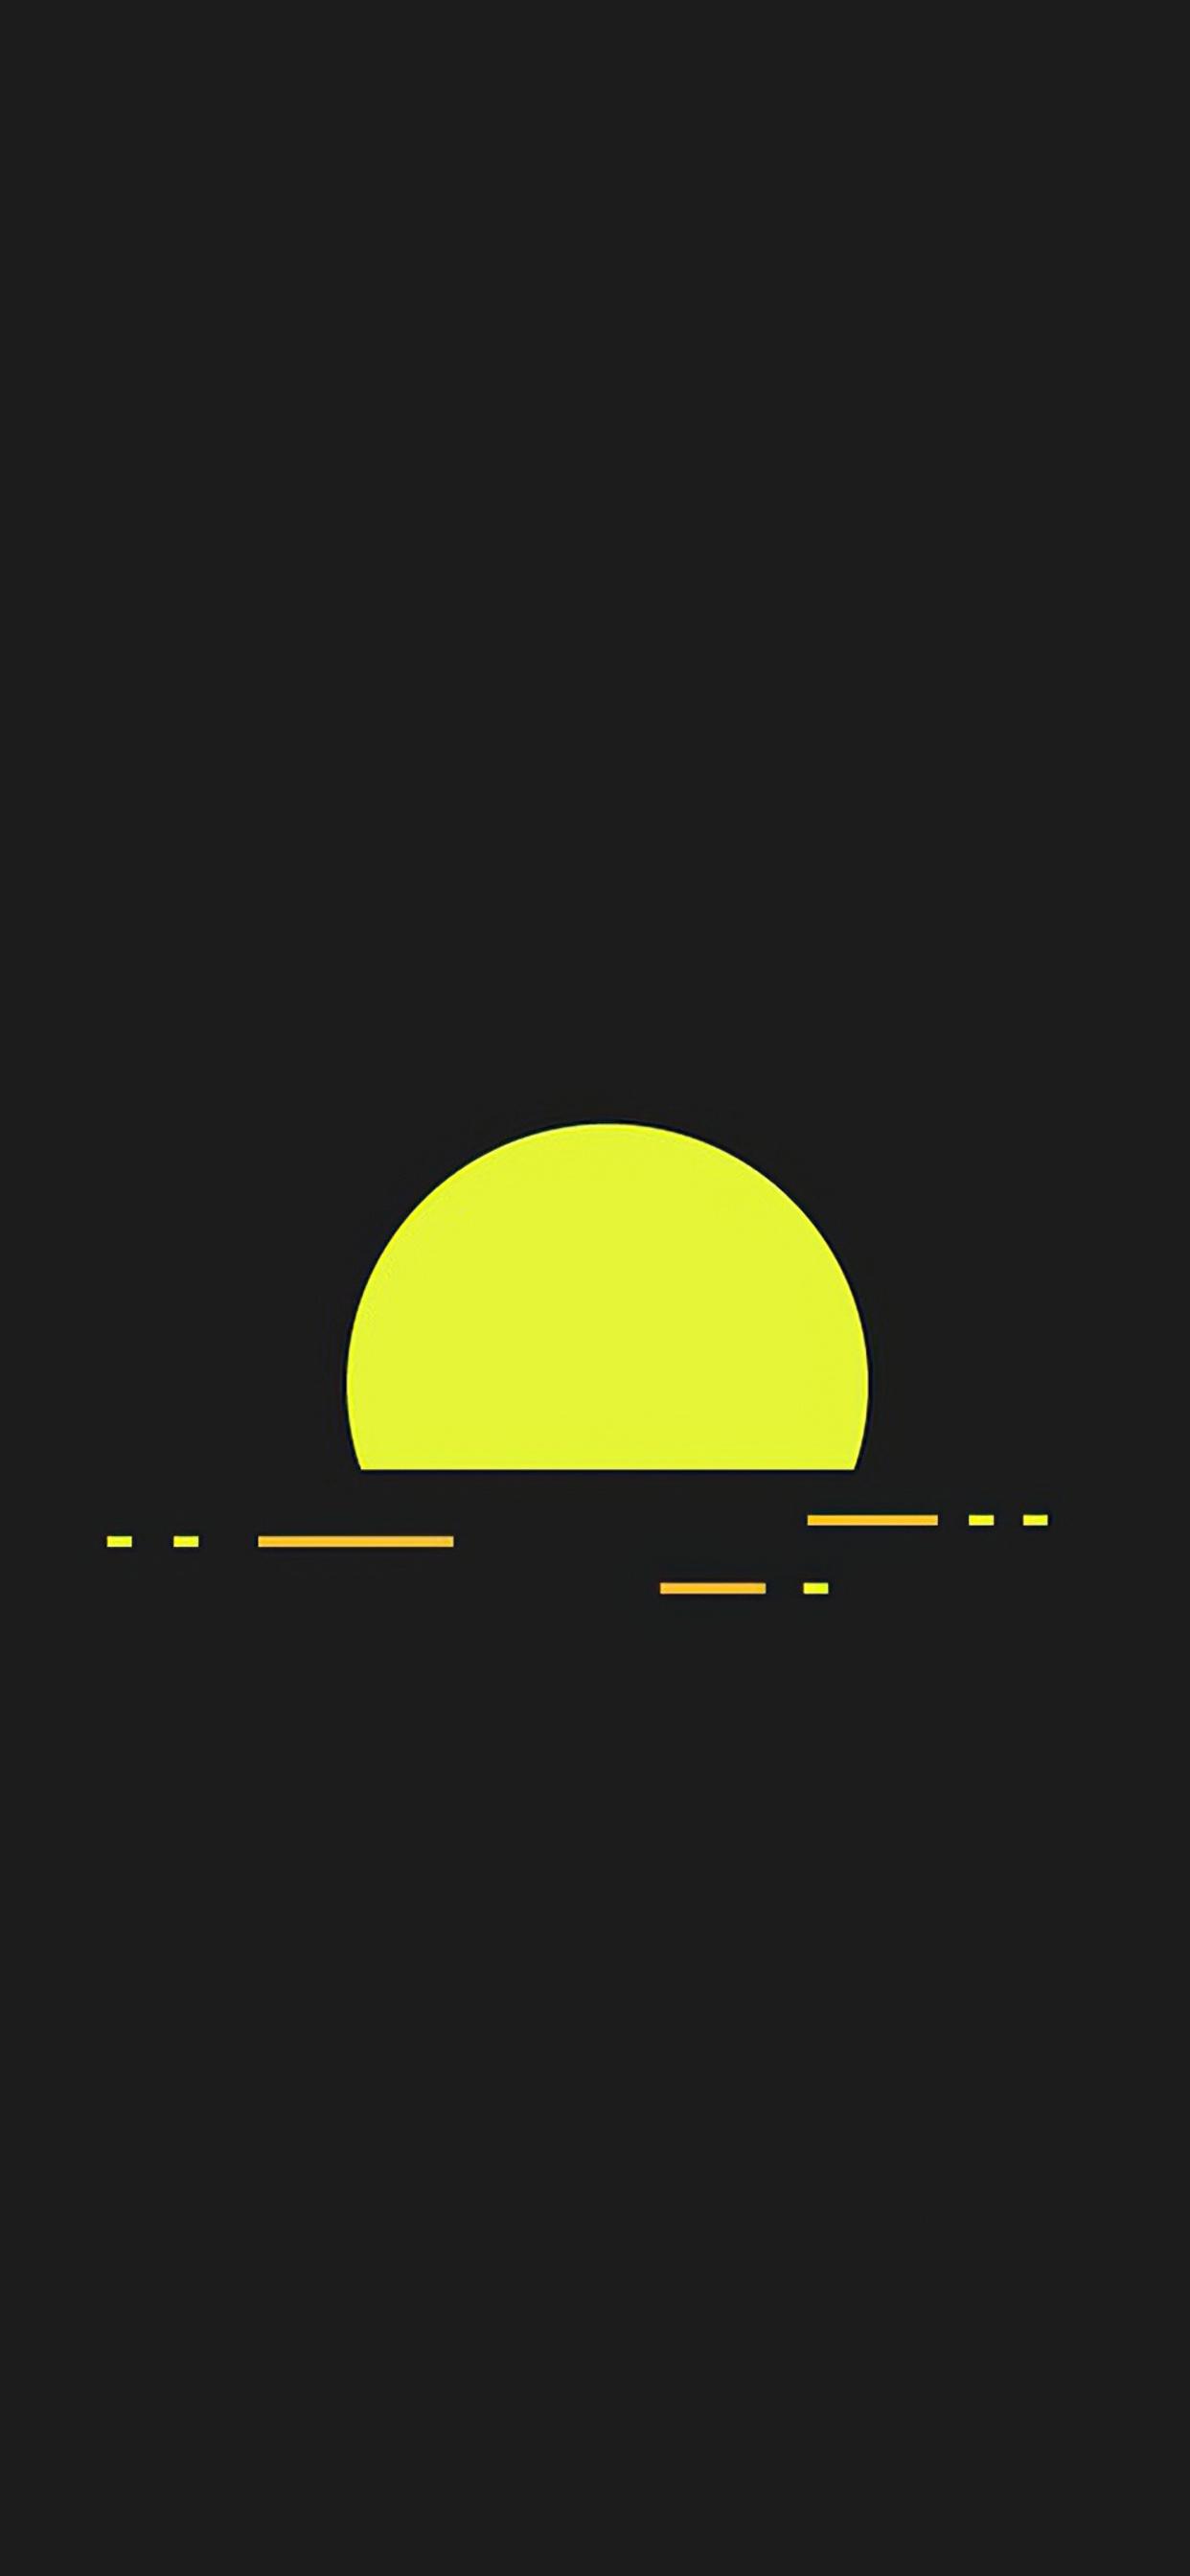 sun-minimal-4k-xz.jpg